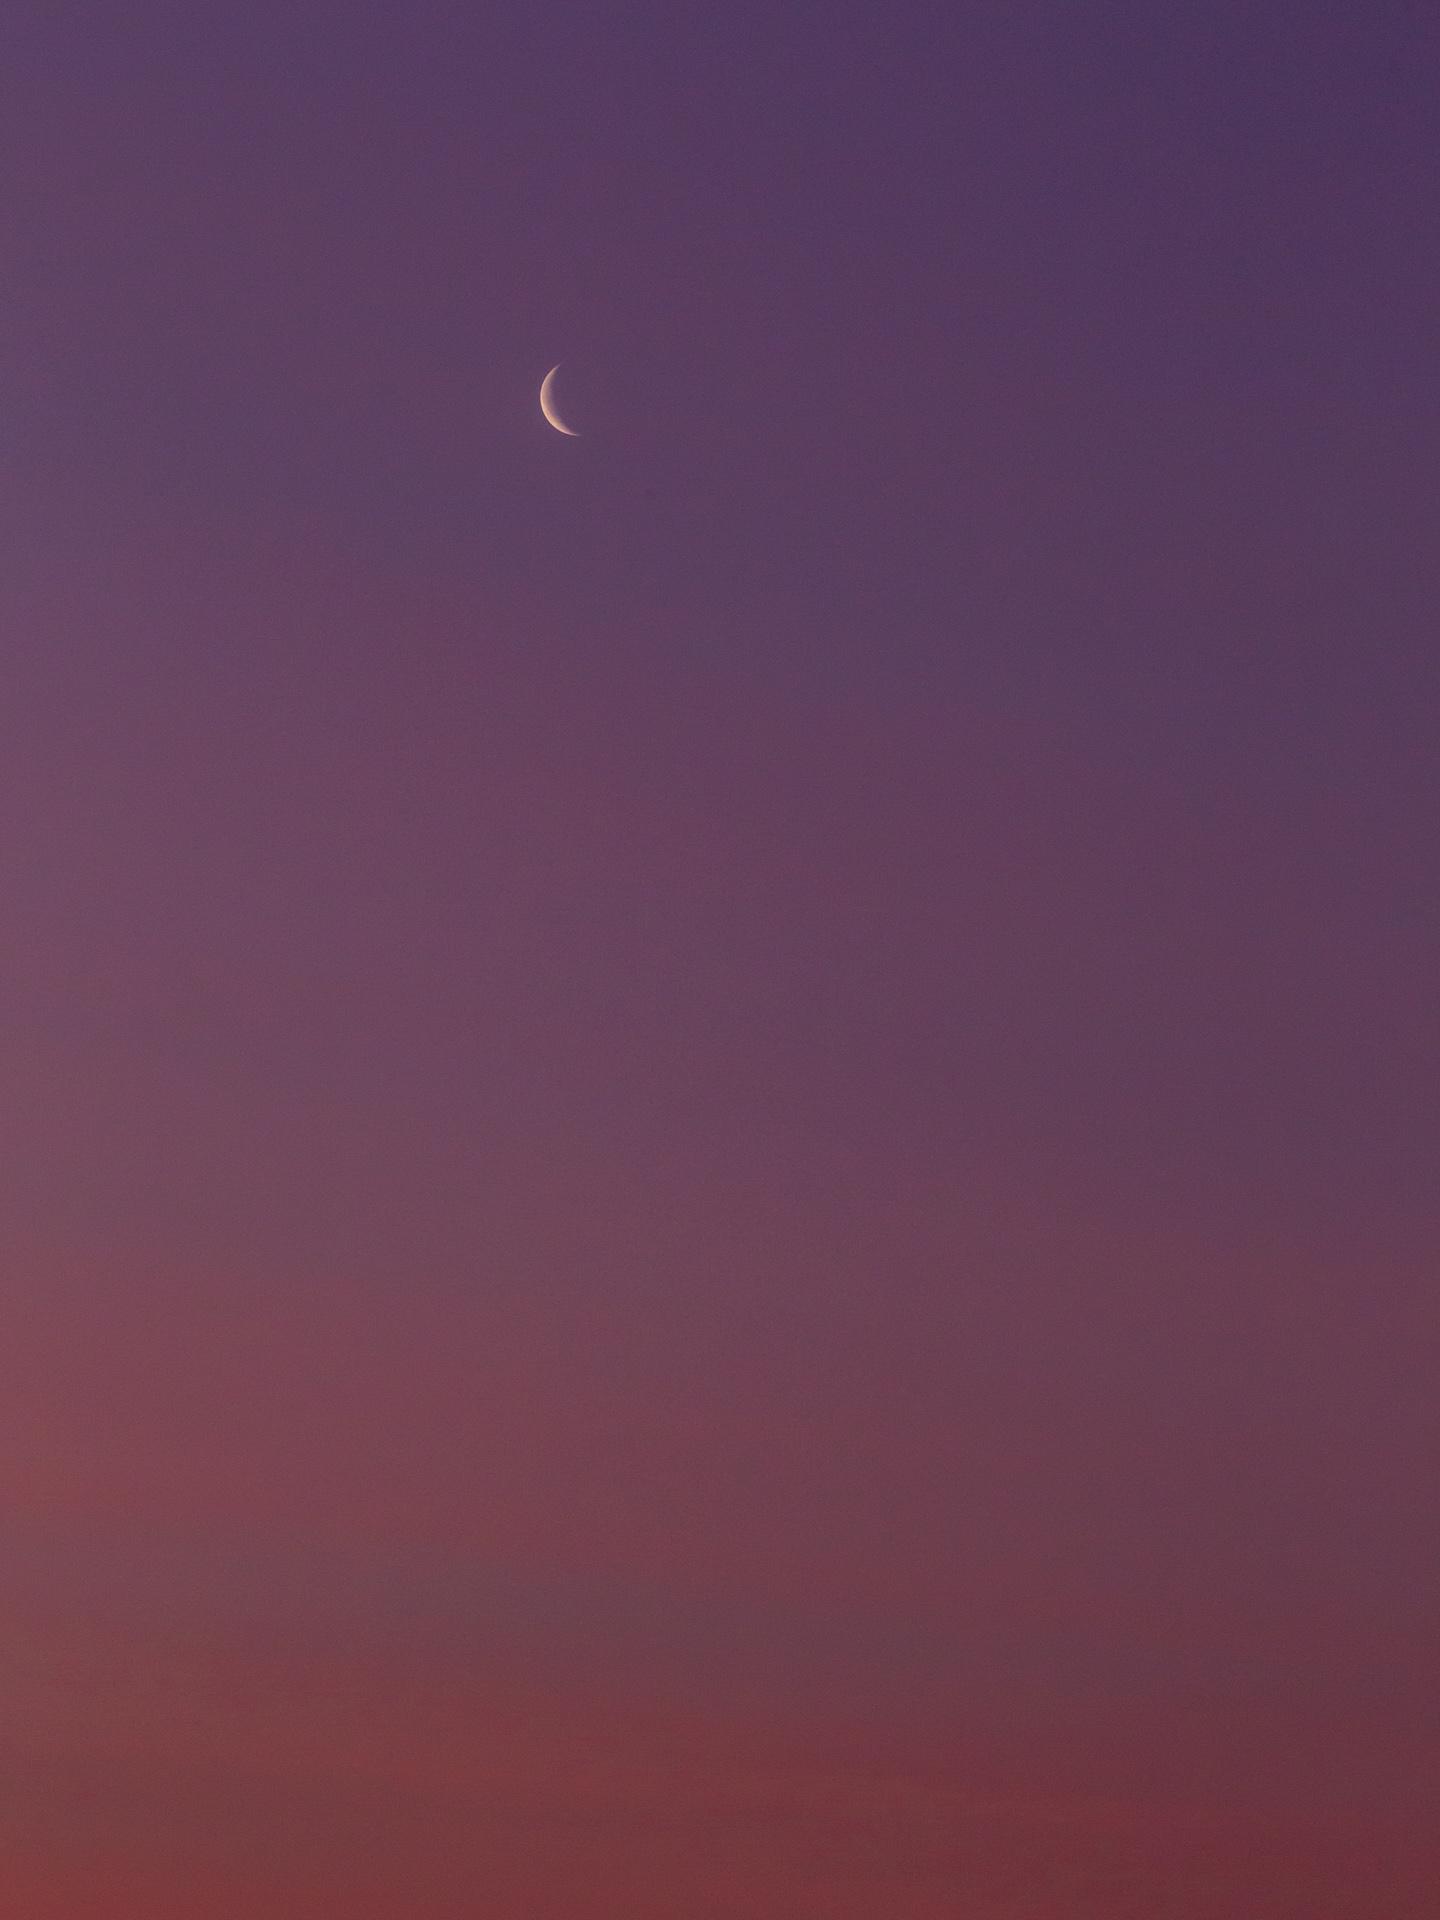 Waning Crescent Moon at Sunrise | 20190430 0601 E:38.96x77.00@84m